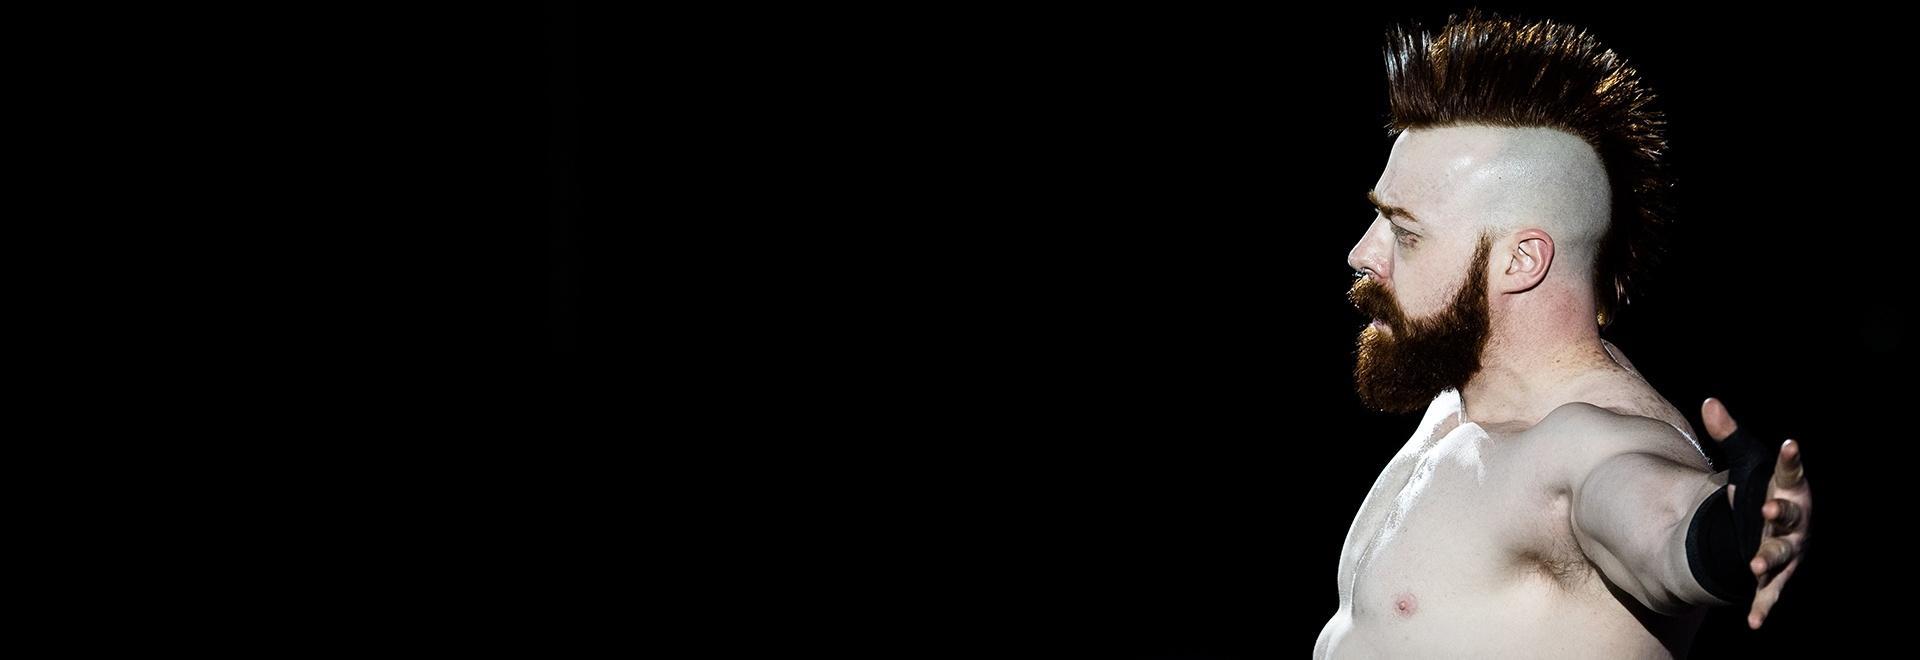 Ep. 38